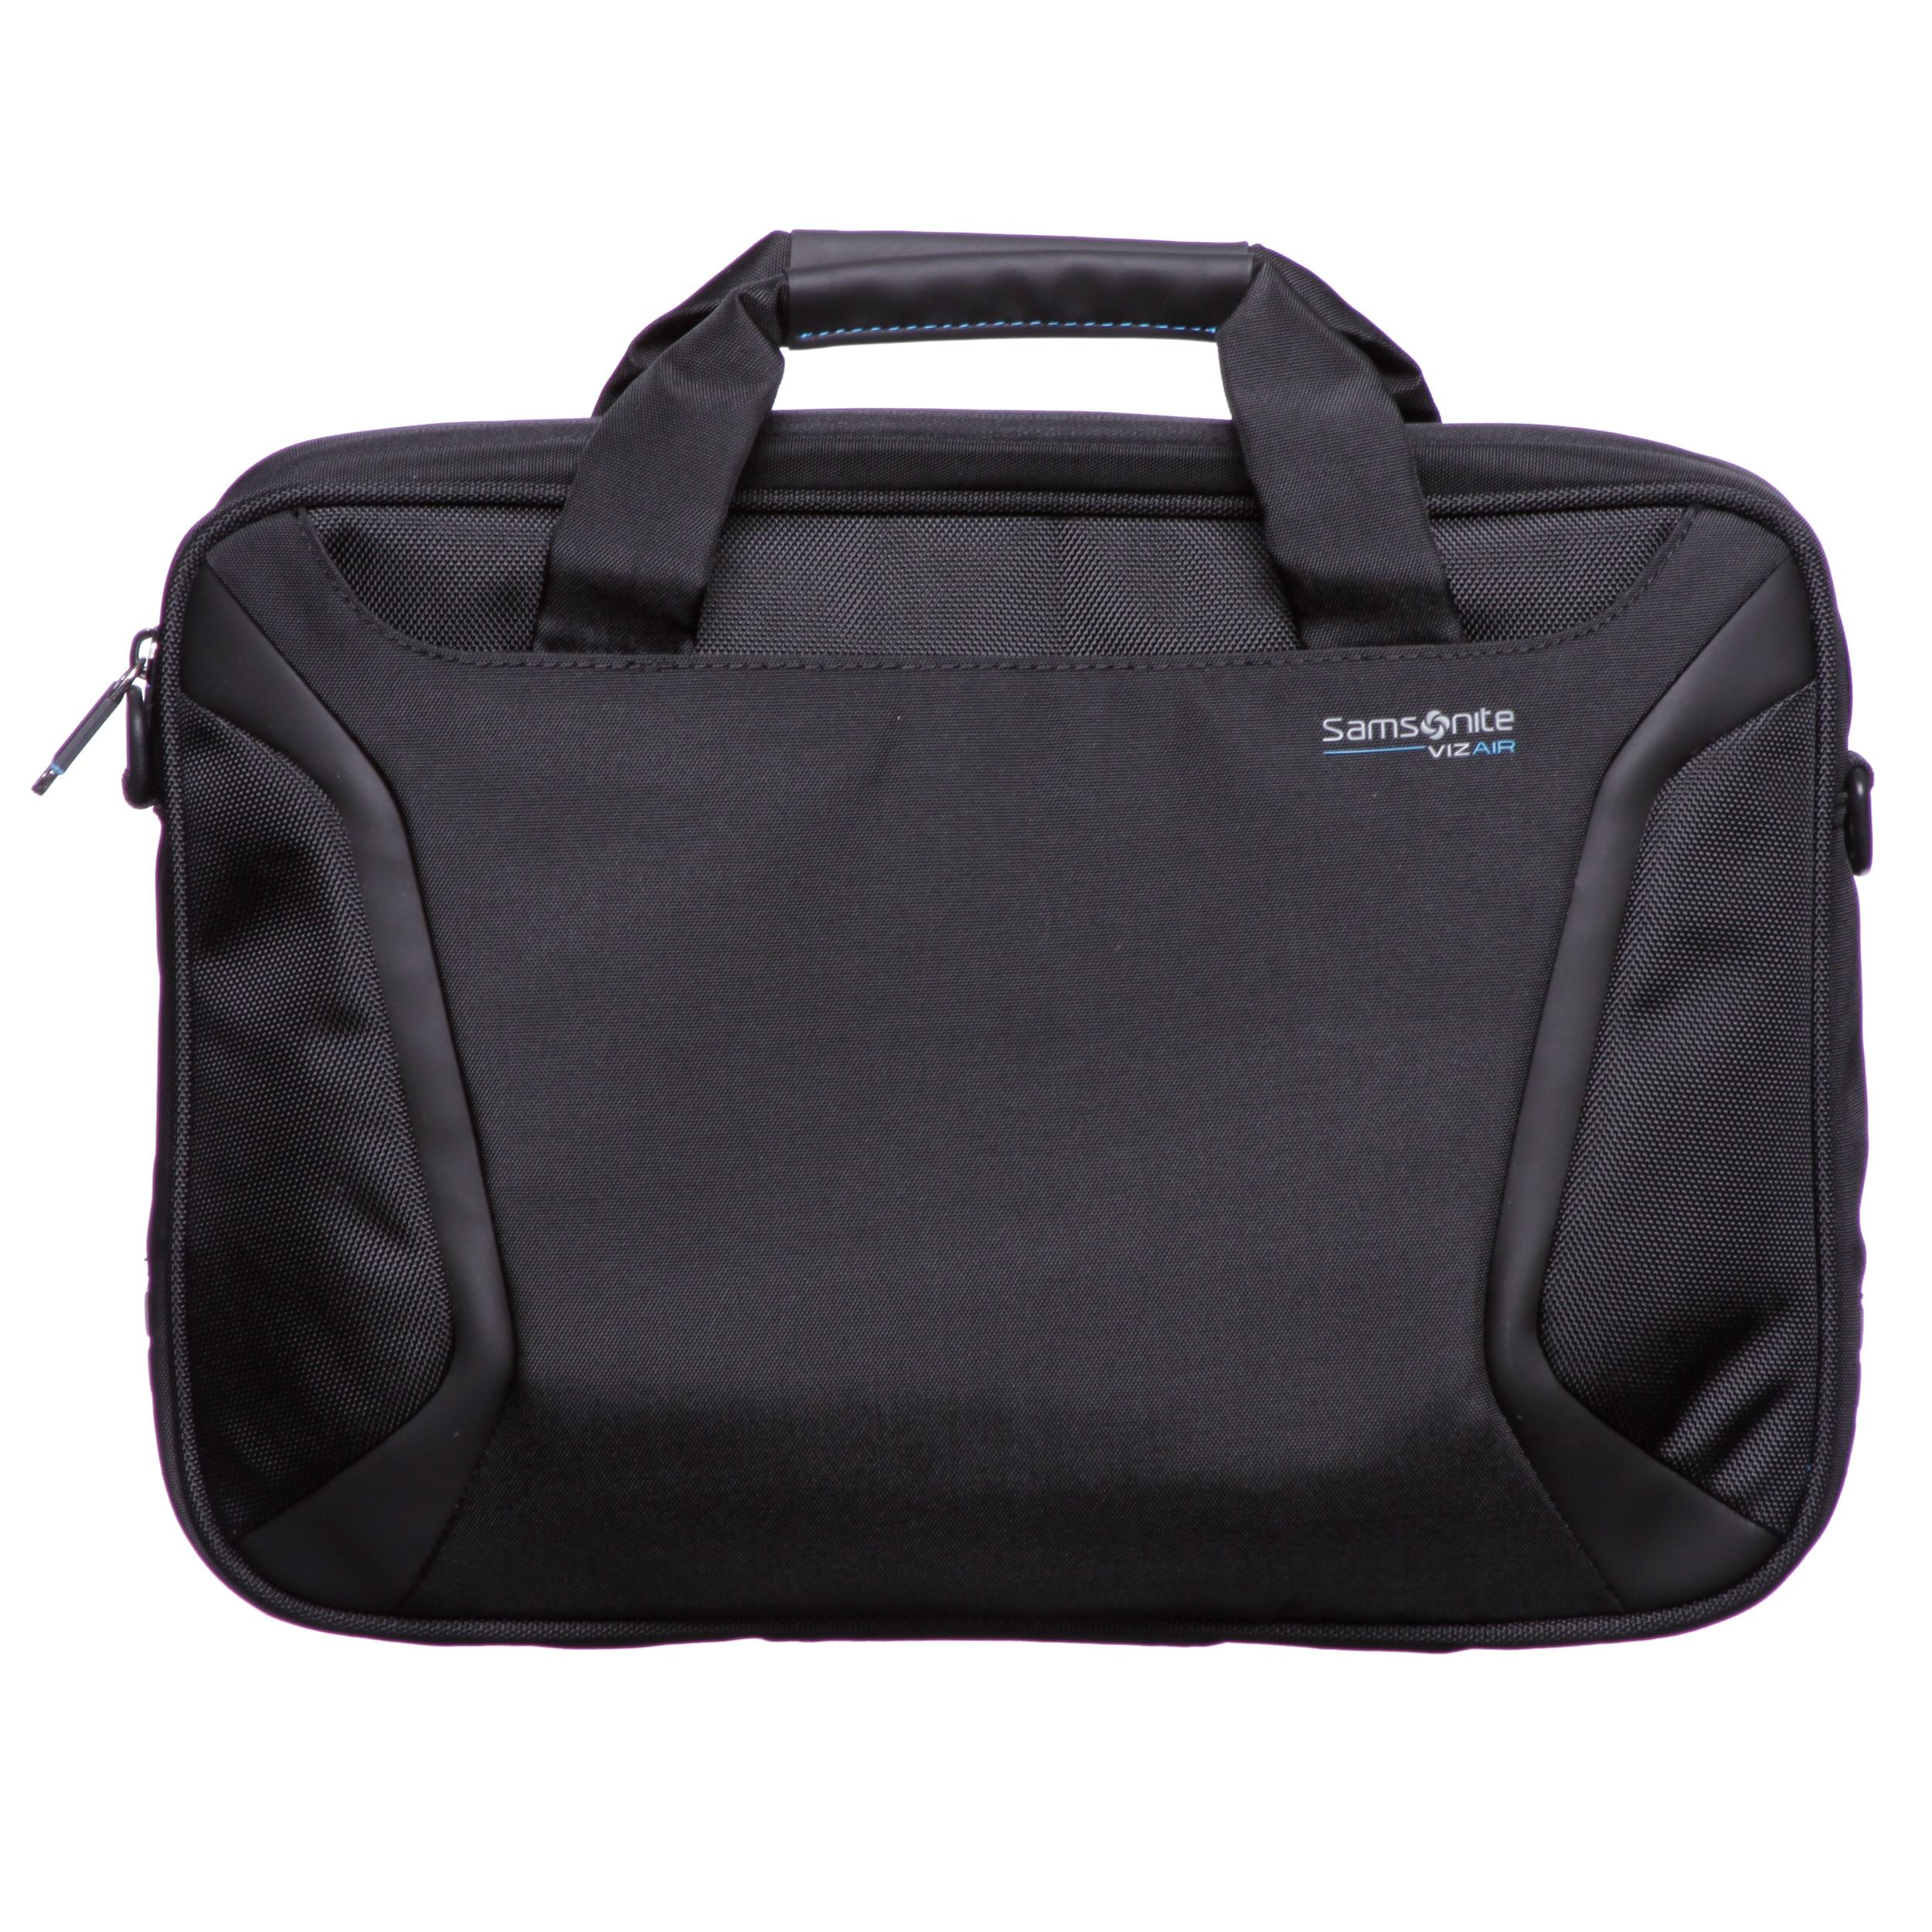 Samsonite   Luggage & Bags Buy Business Cases, Travel